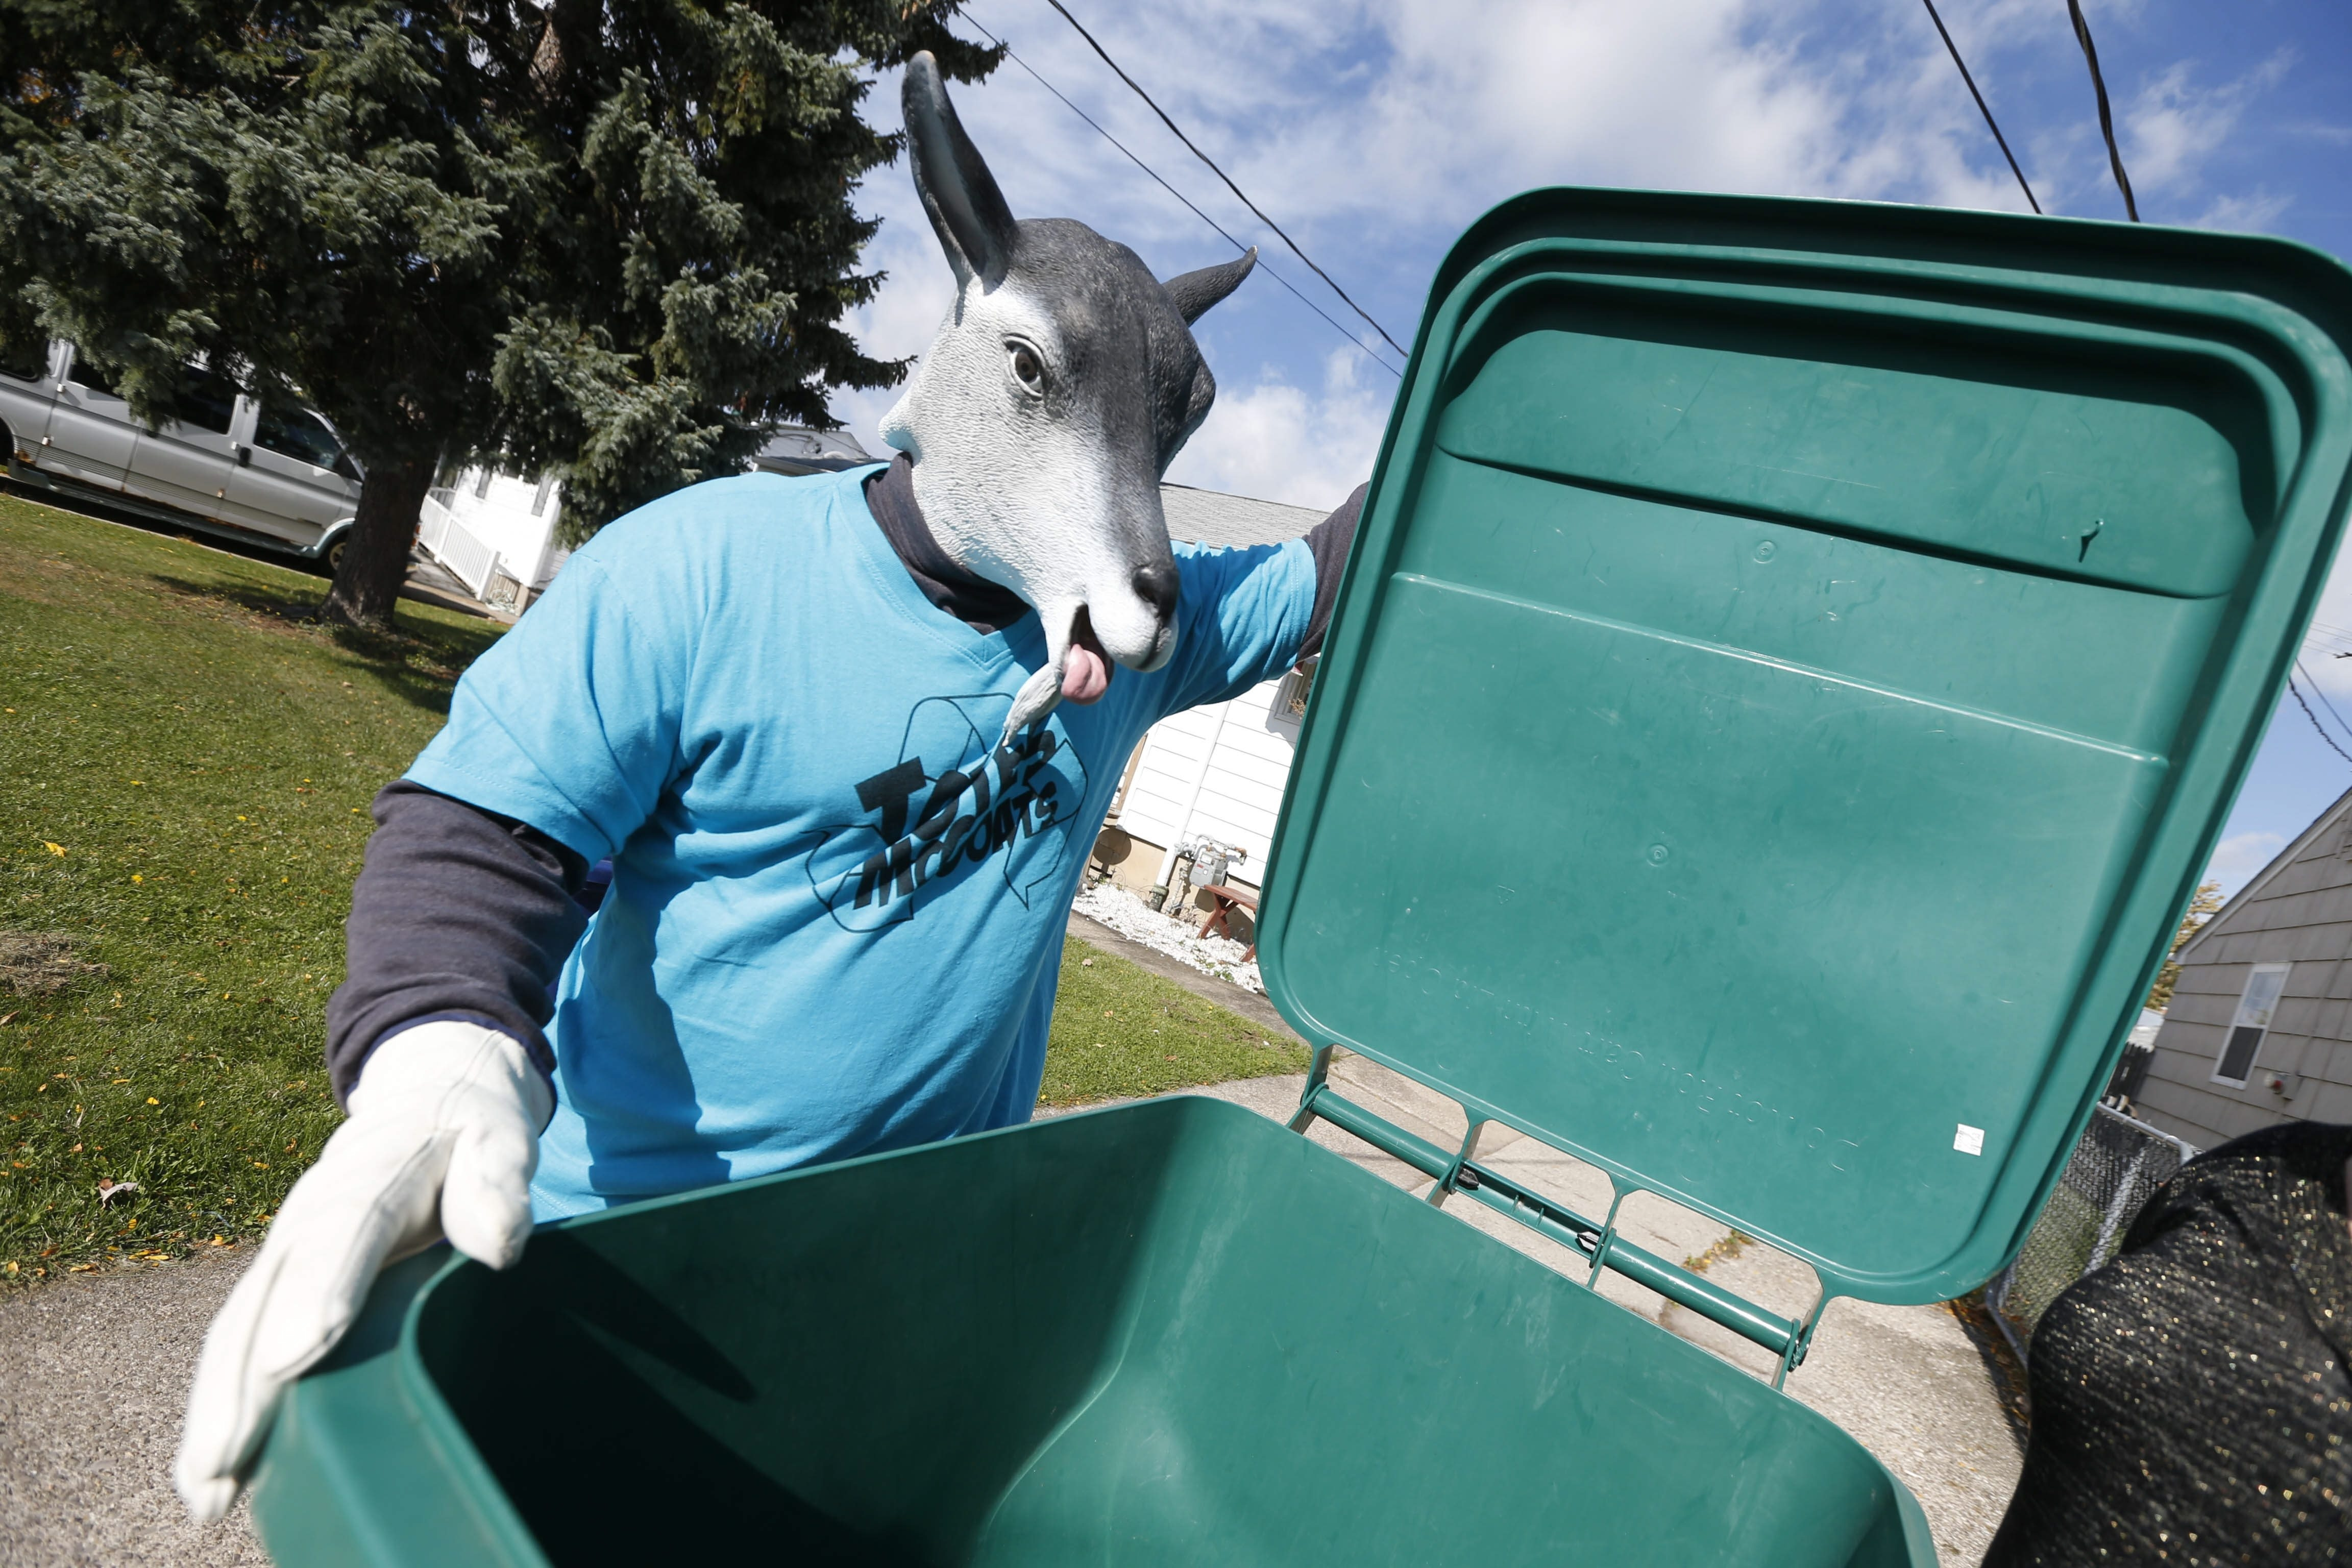 Niagara Falls recycling mascot Totes McGoats is seen at a park on Jerauld Street in Niagara Falls on Oct. 15, 2015. (Robert Kirkham/Buffalo News file photo)